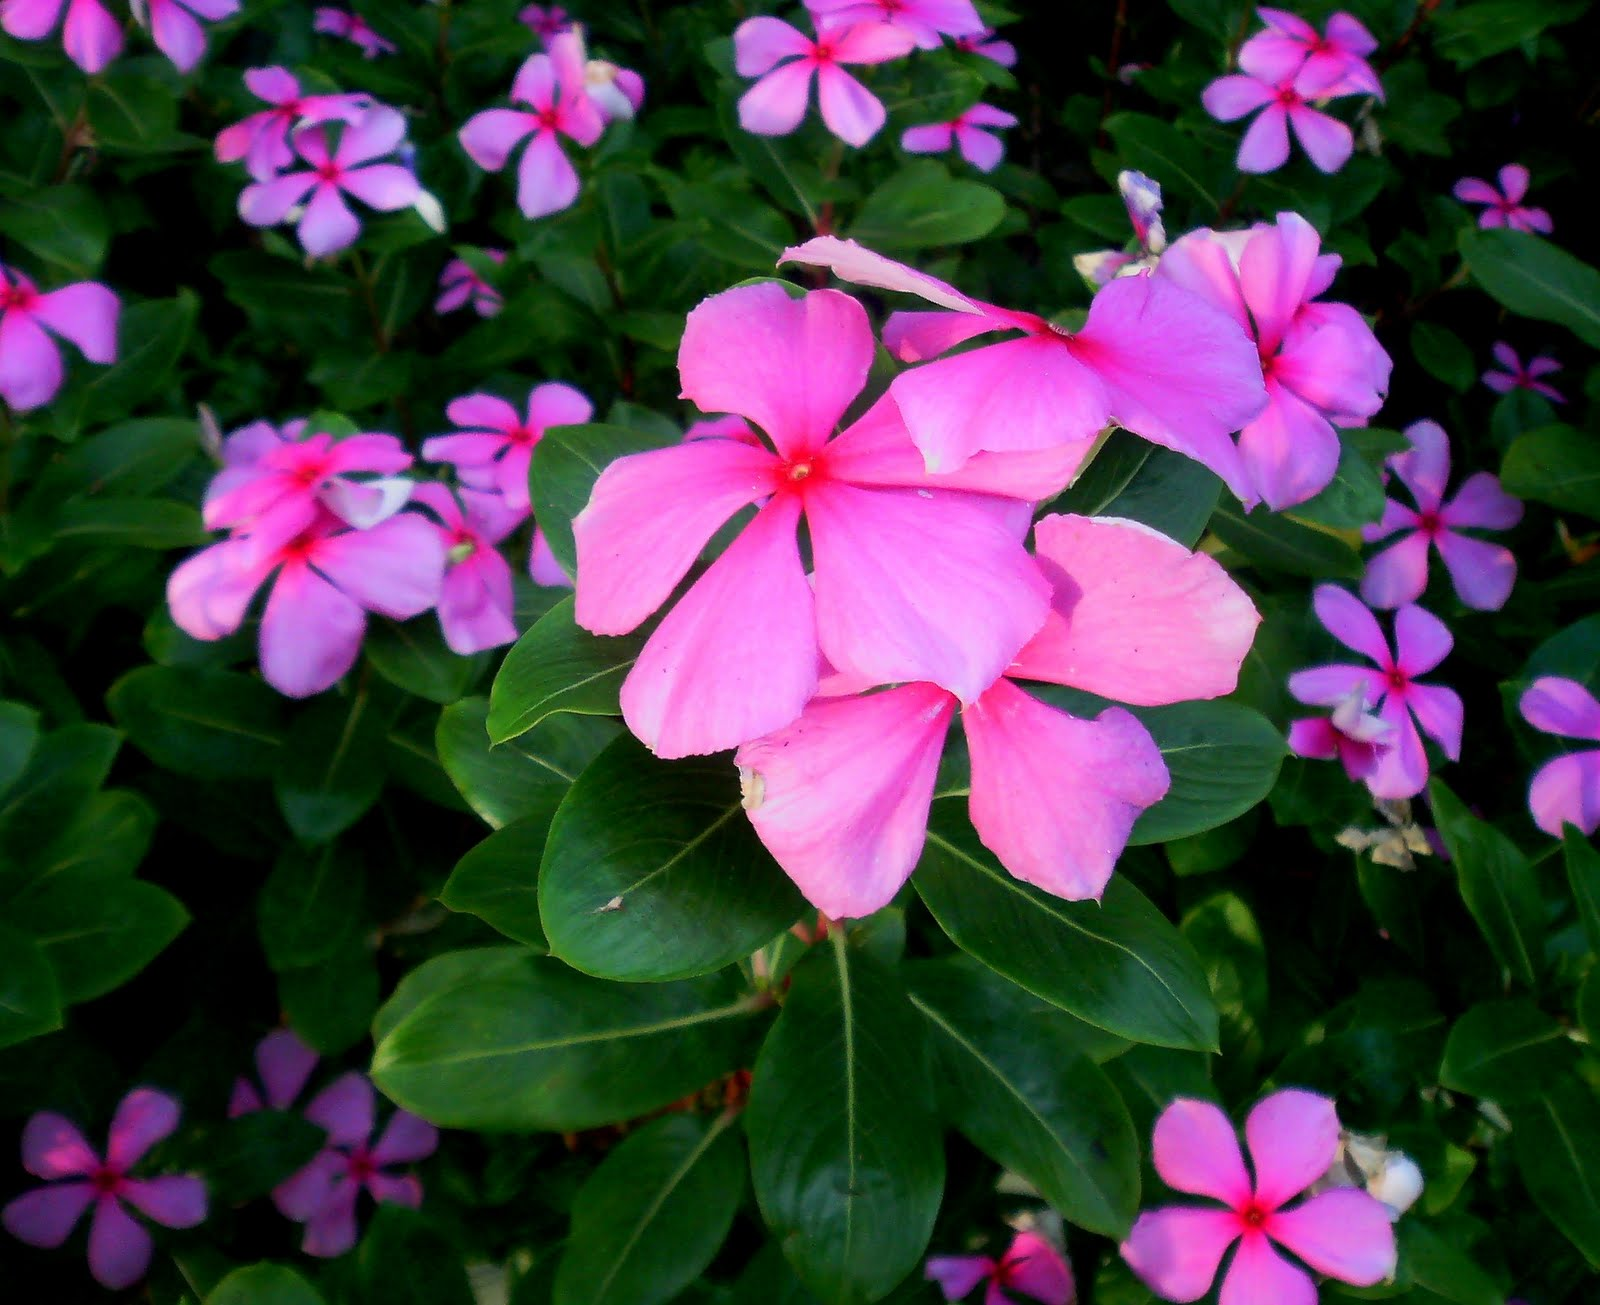 Laman Kambatik Plants list 3rd ed Vinca rosea Madagascar Periwinkle